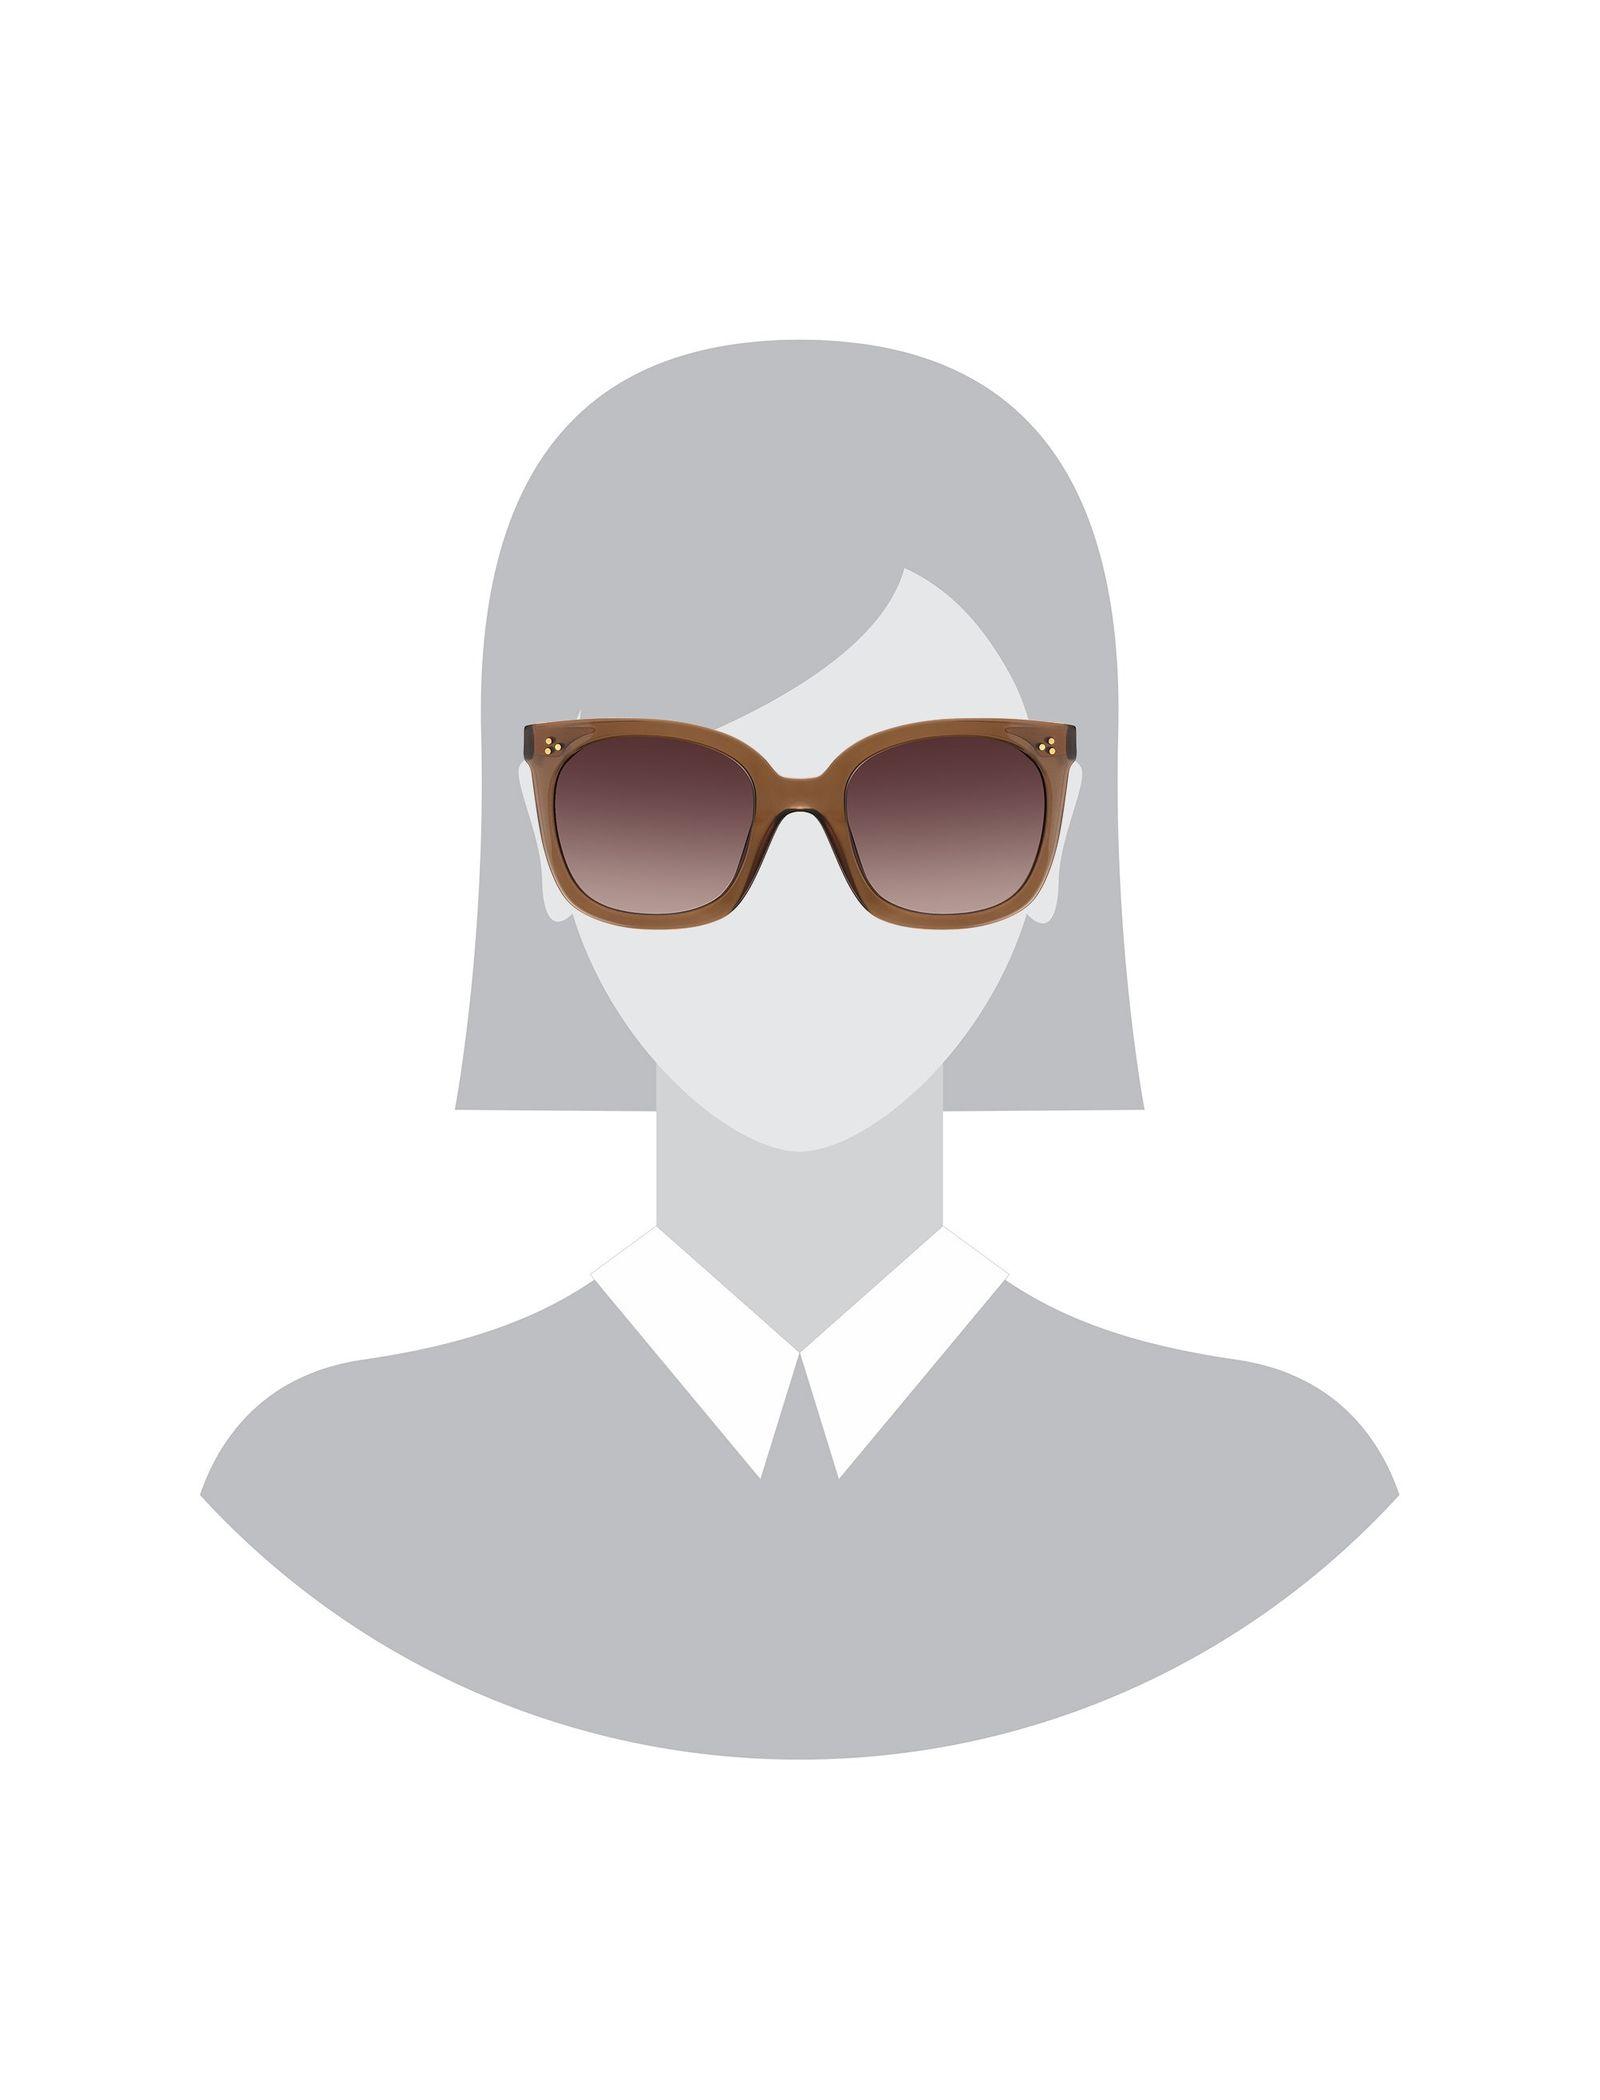 عینک آفتابی ویفرر زنانه - ماژ - قهوه اي - 5